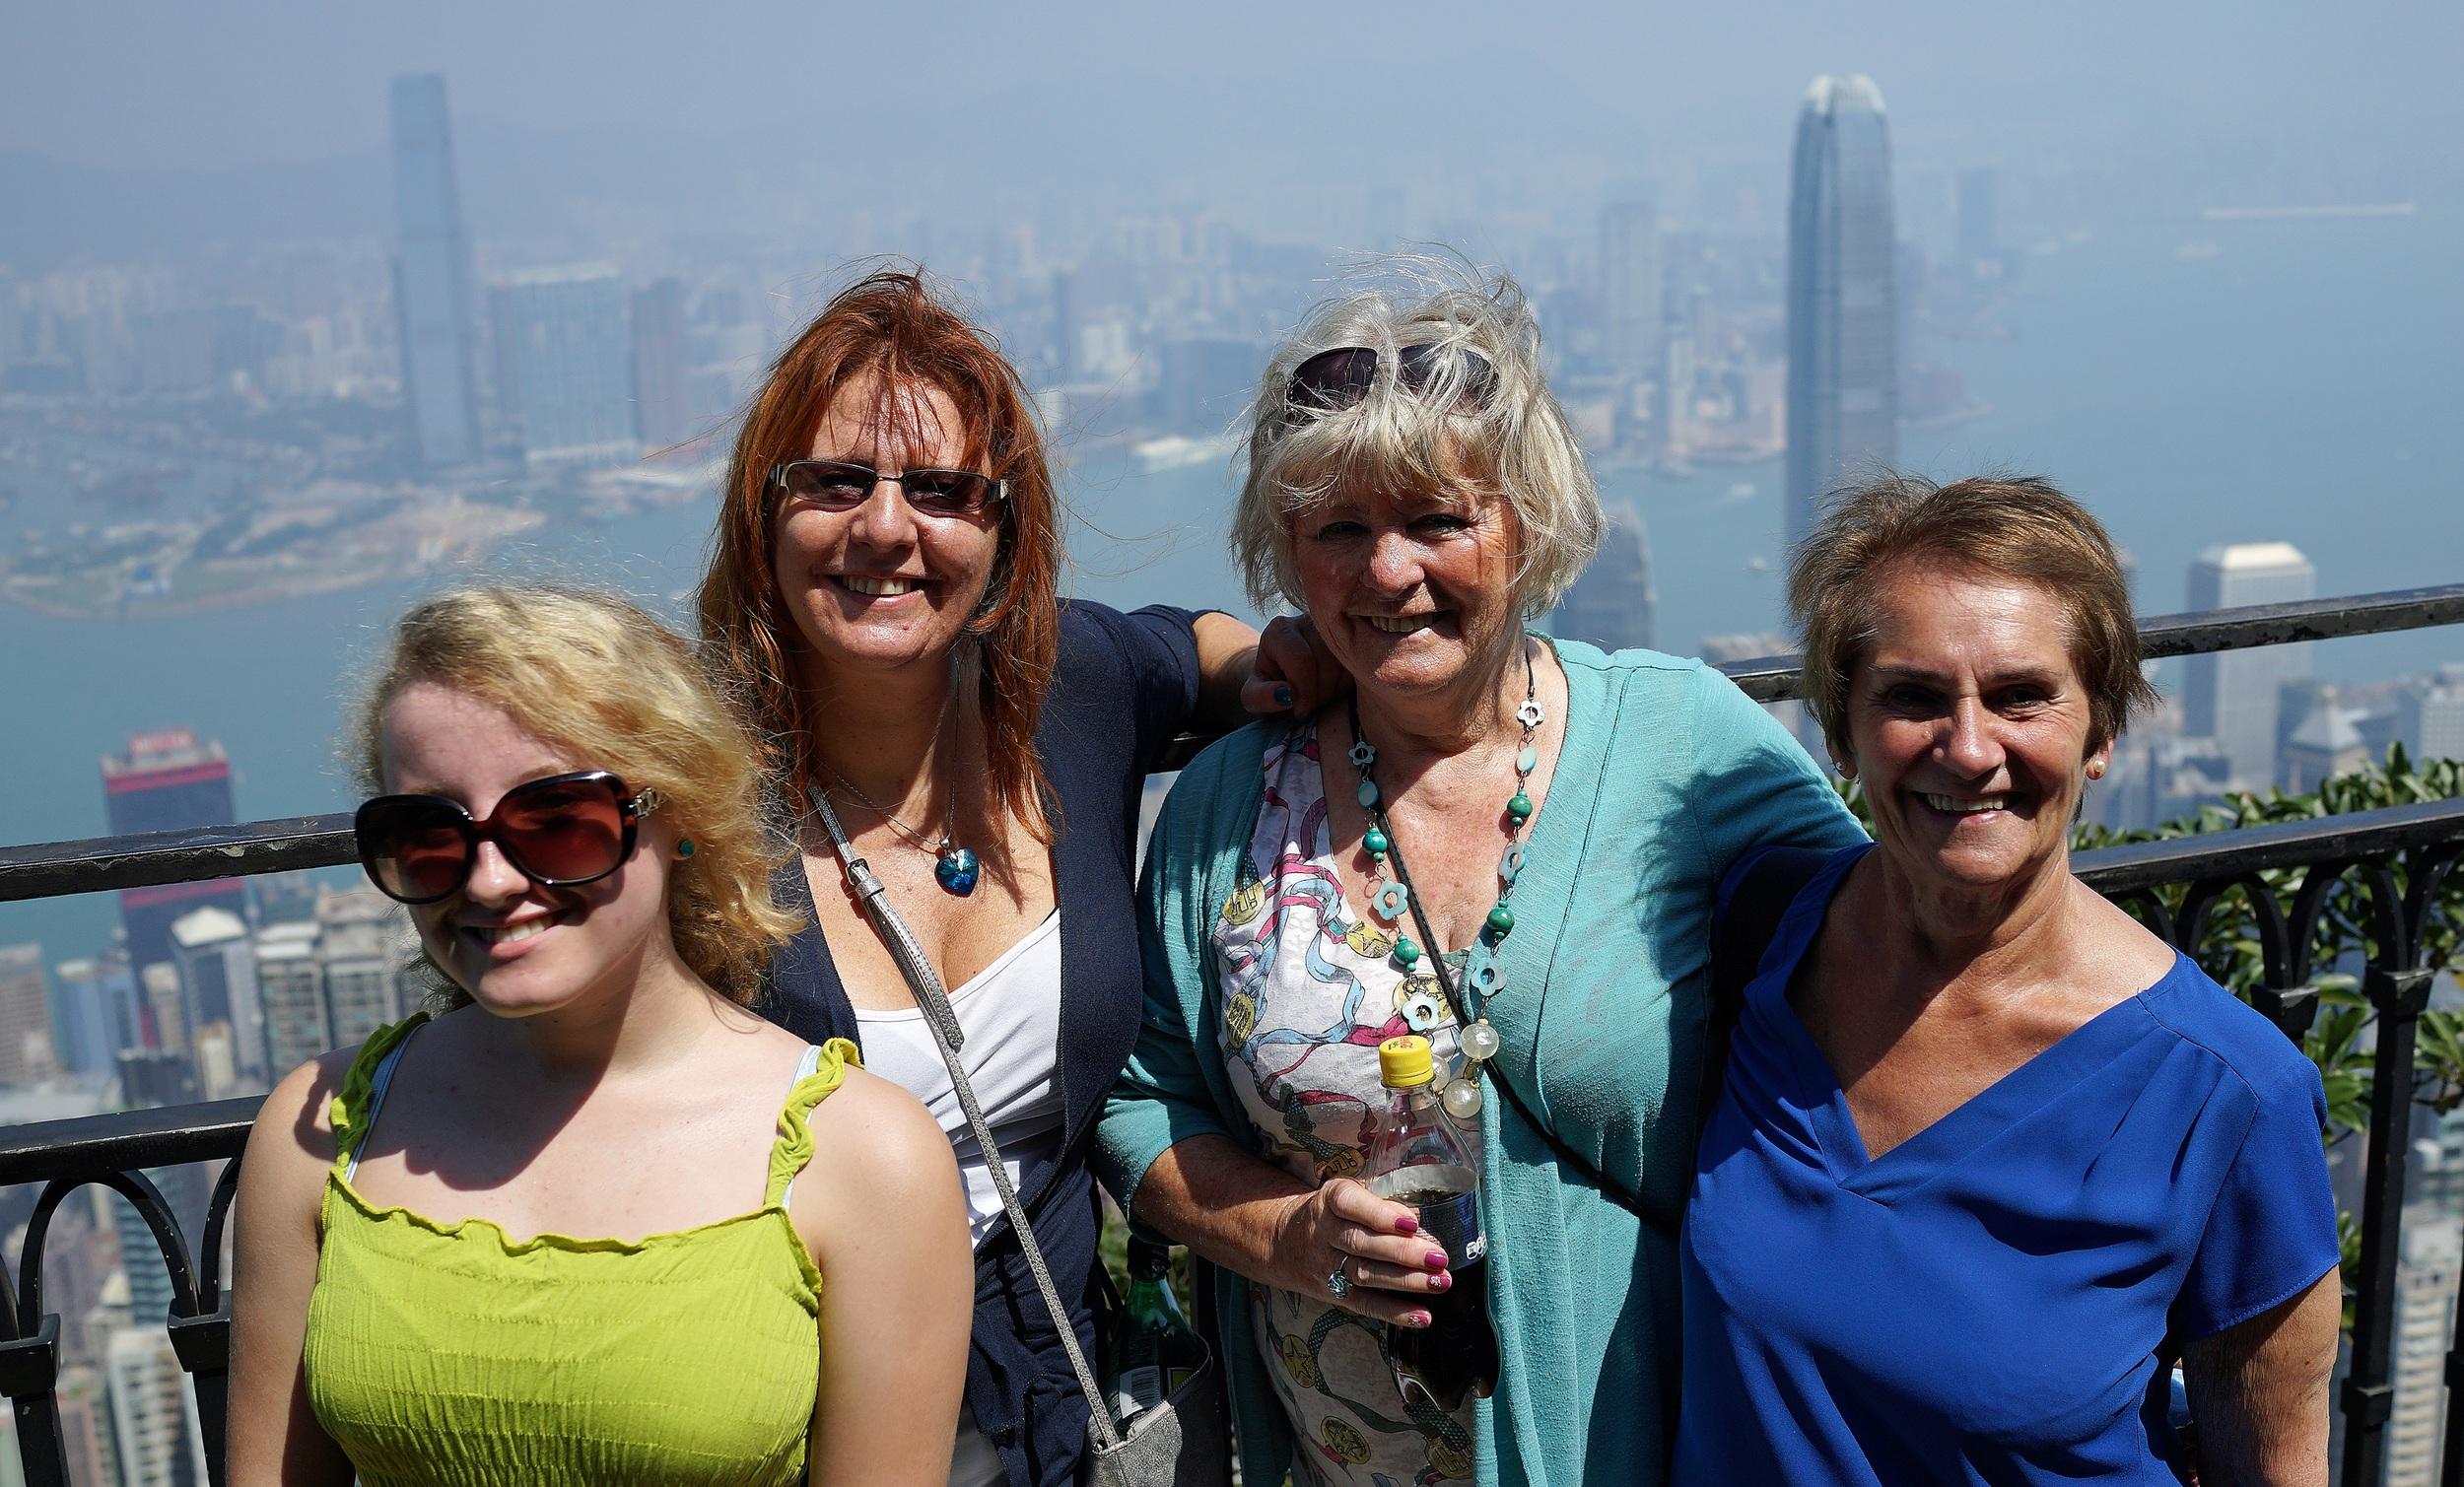 Meet Debra, Debra's Mum, Debra's daughter Isobel and Debra's Mum's friend Doreen enjoying the amazing views from my spot at the Peak, ladies, it was a pleasure!